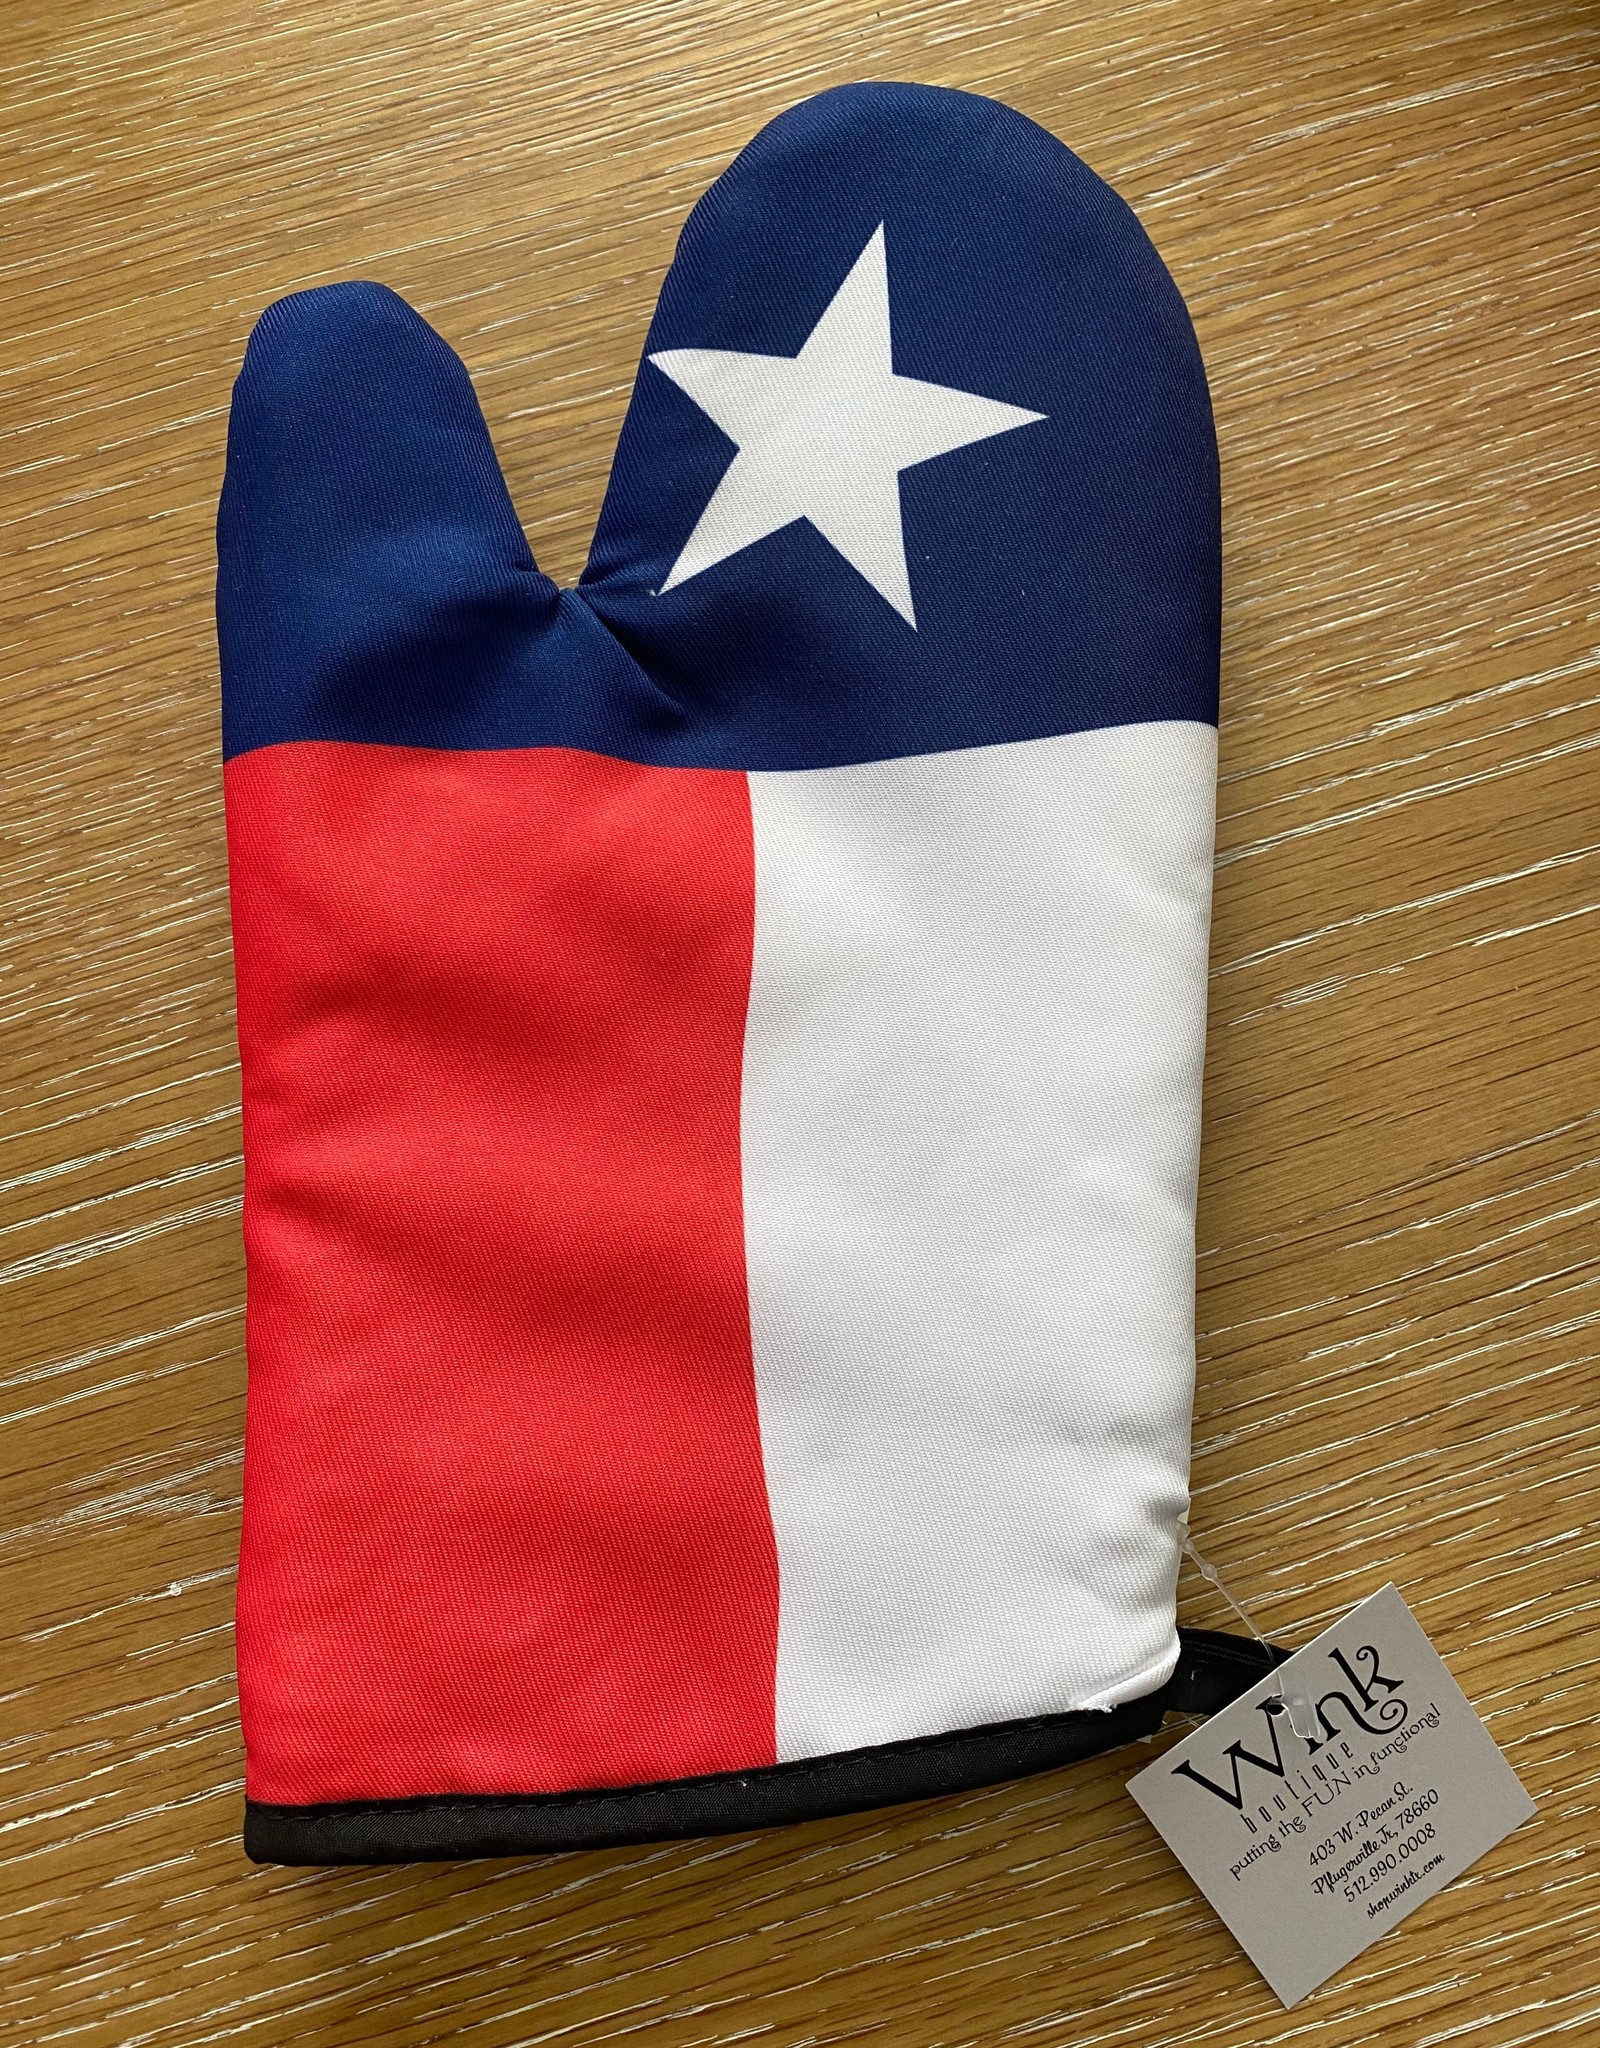 Wink Oven Mitt - Texas Flag